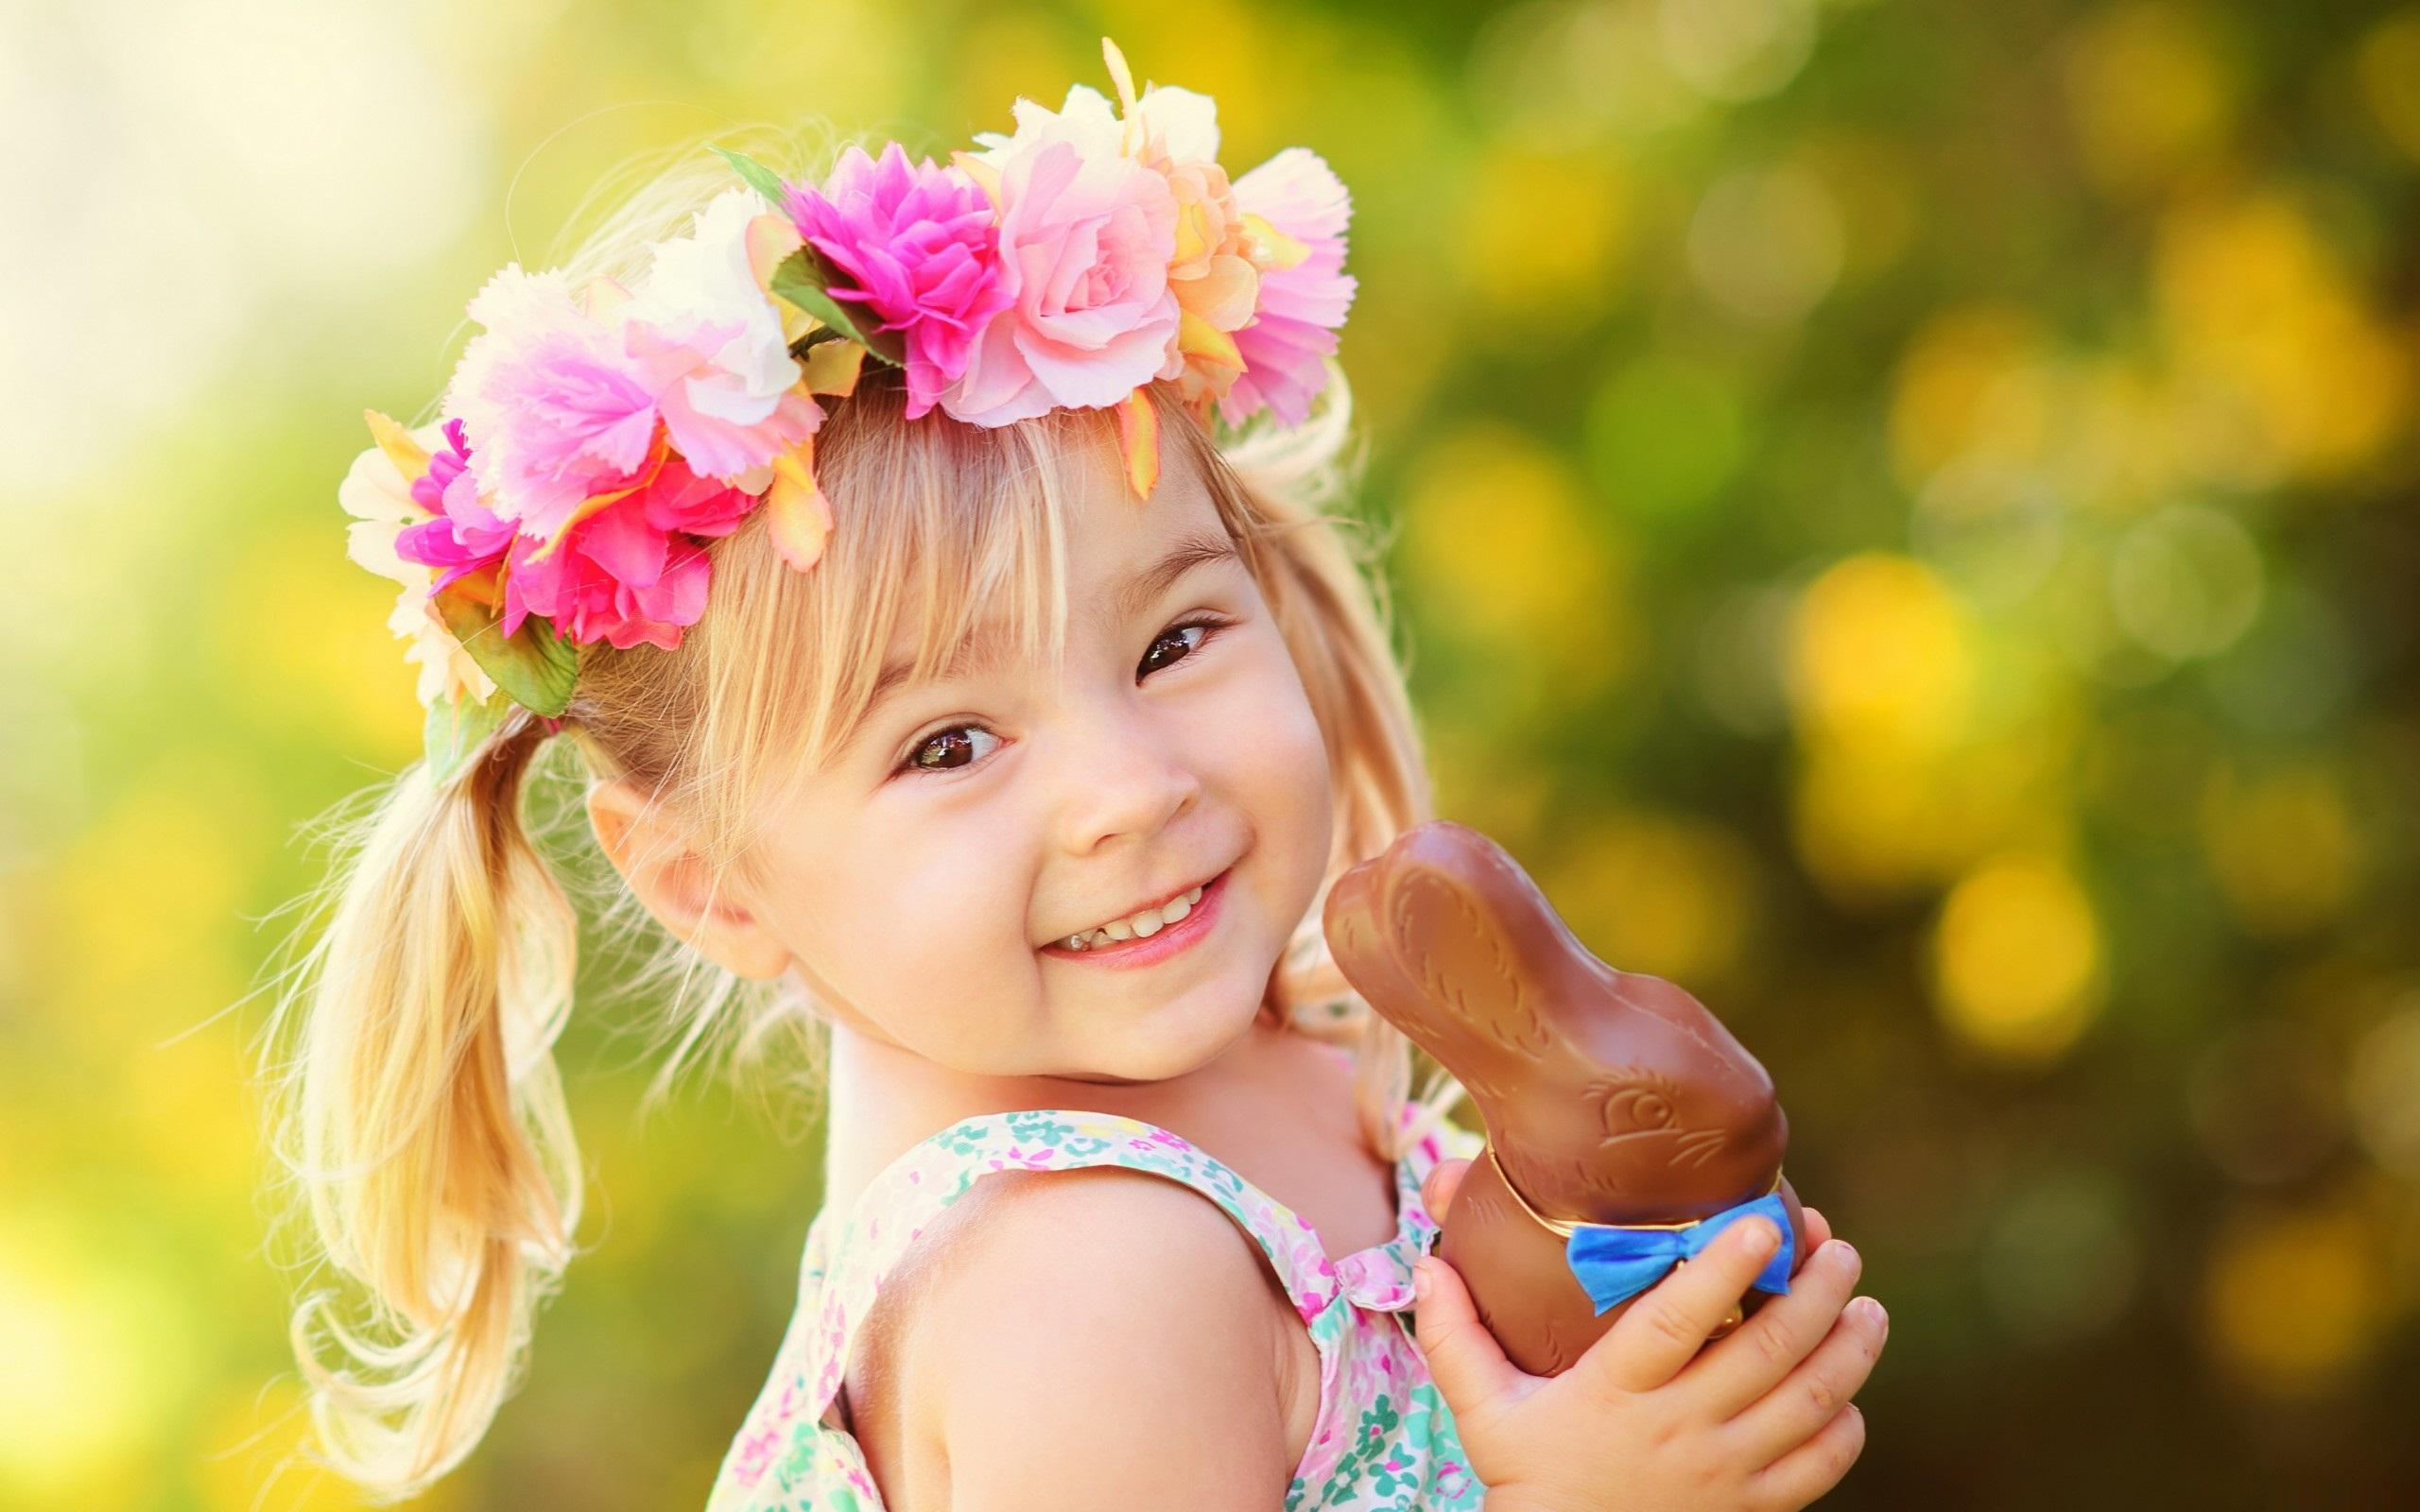 Lovely kid photo